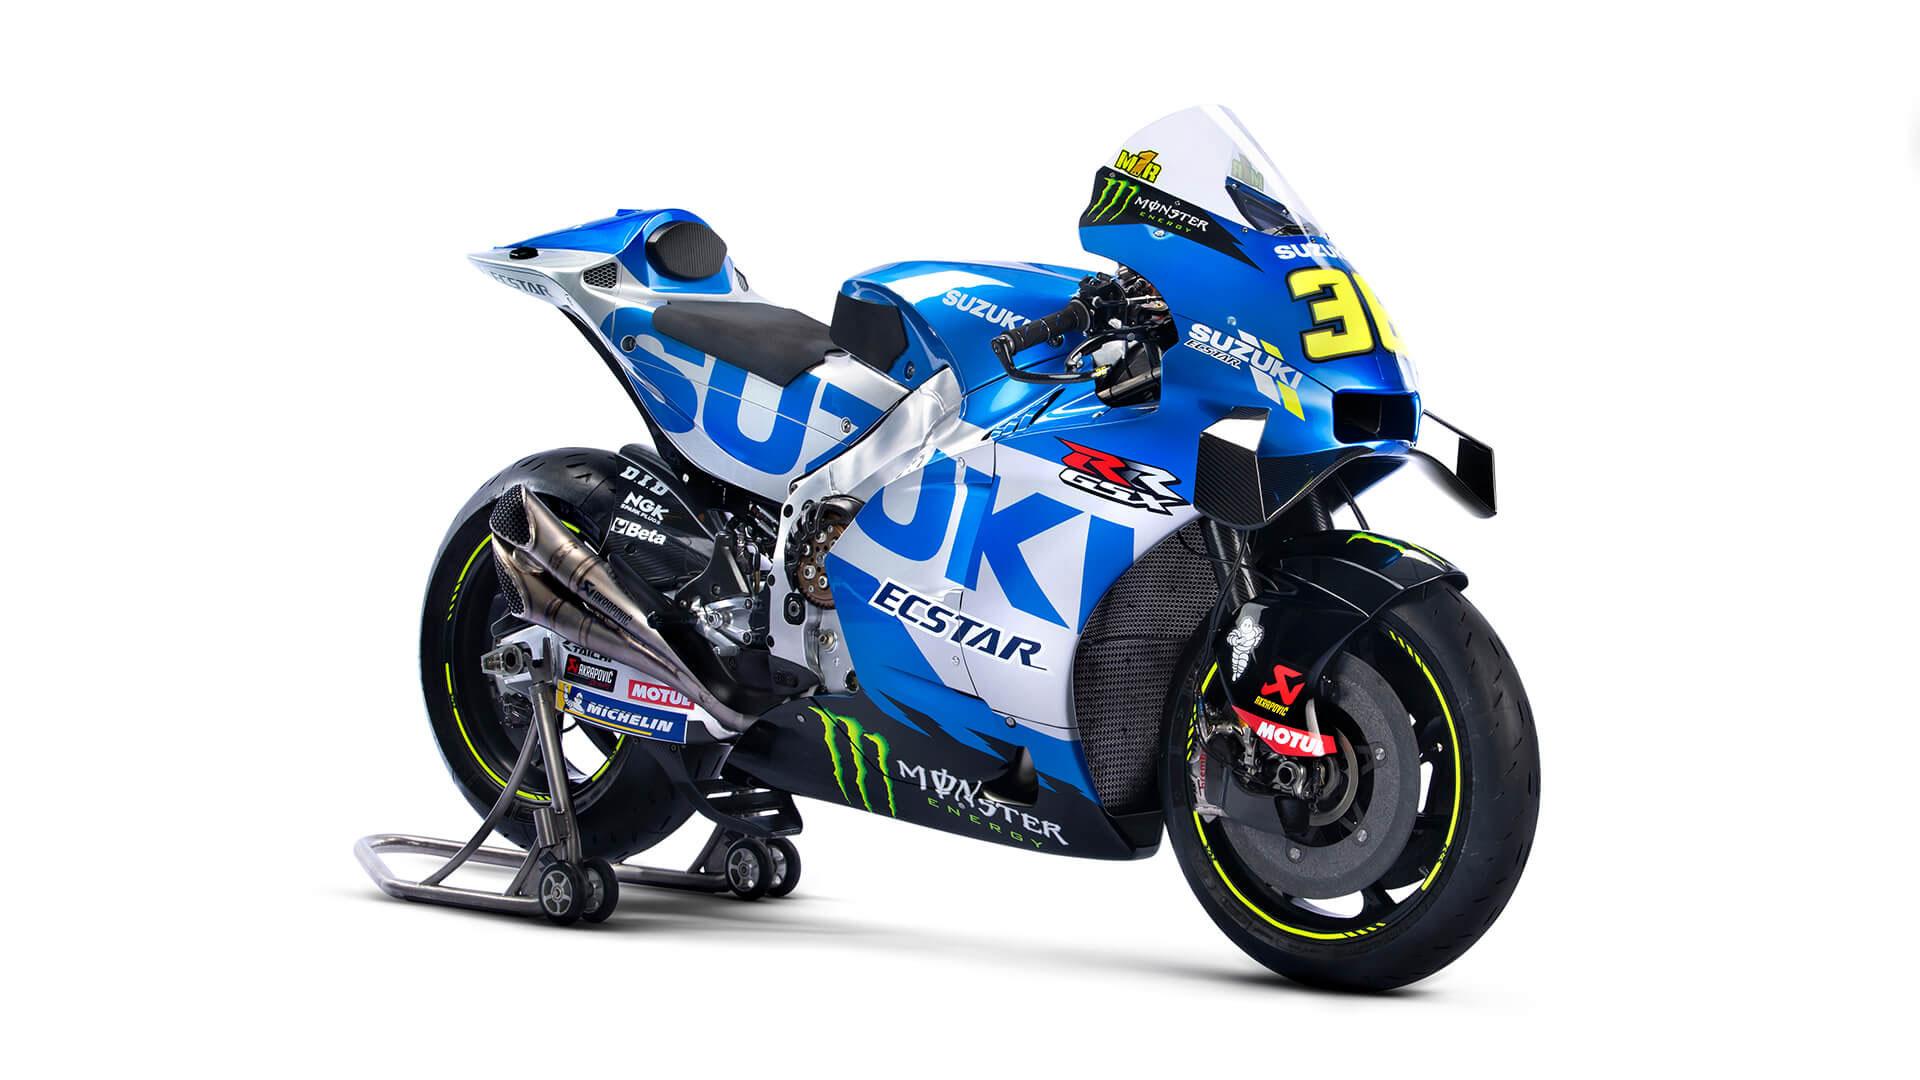 Le Team Suzuki Ecstar